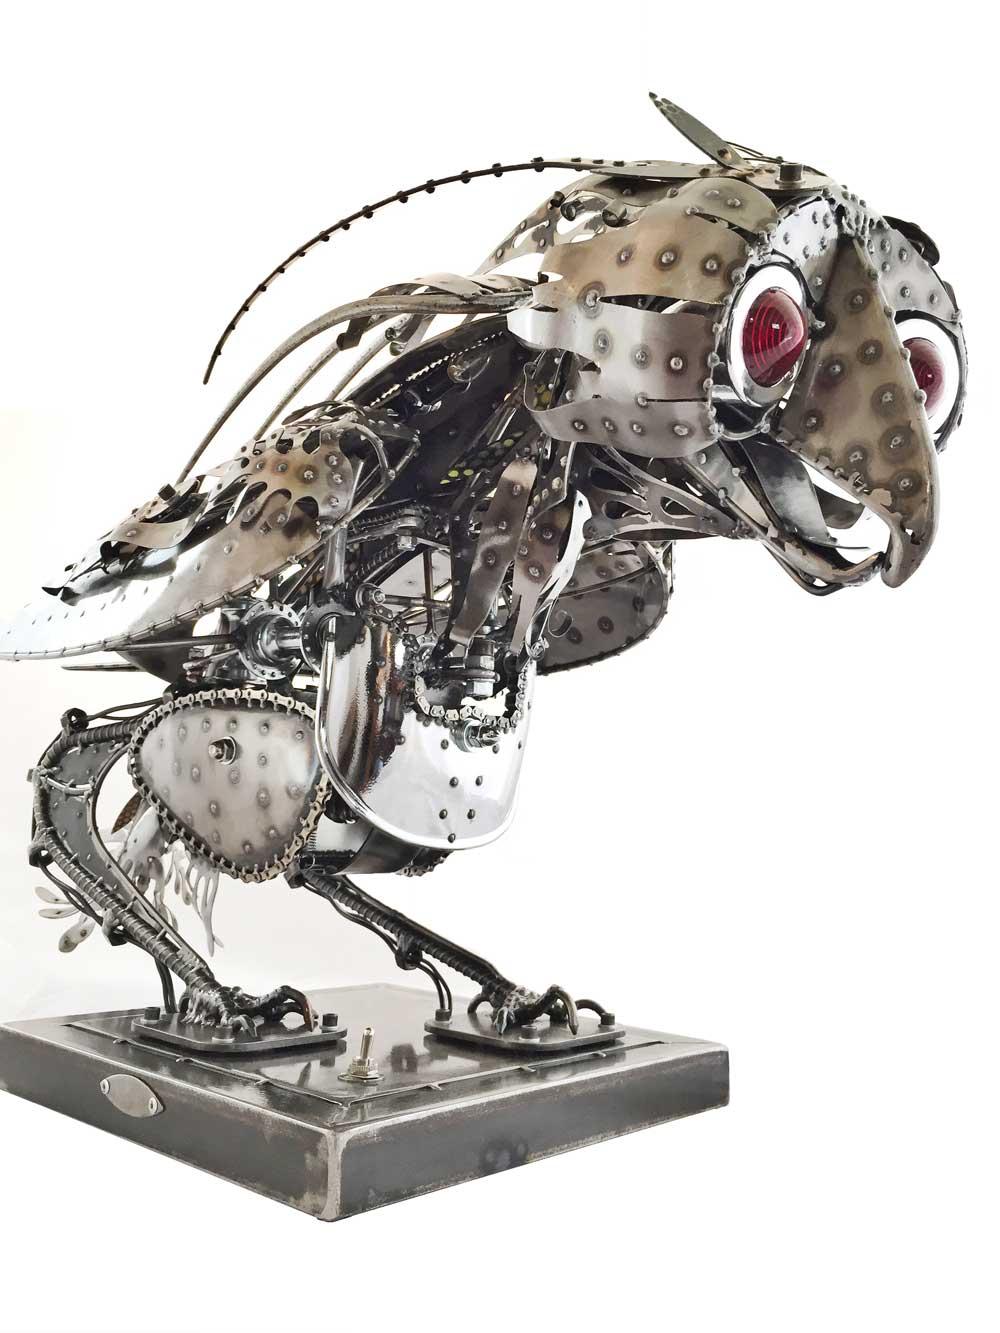 Chandelle Kinetic Sculpture by Chris Cole detail 002